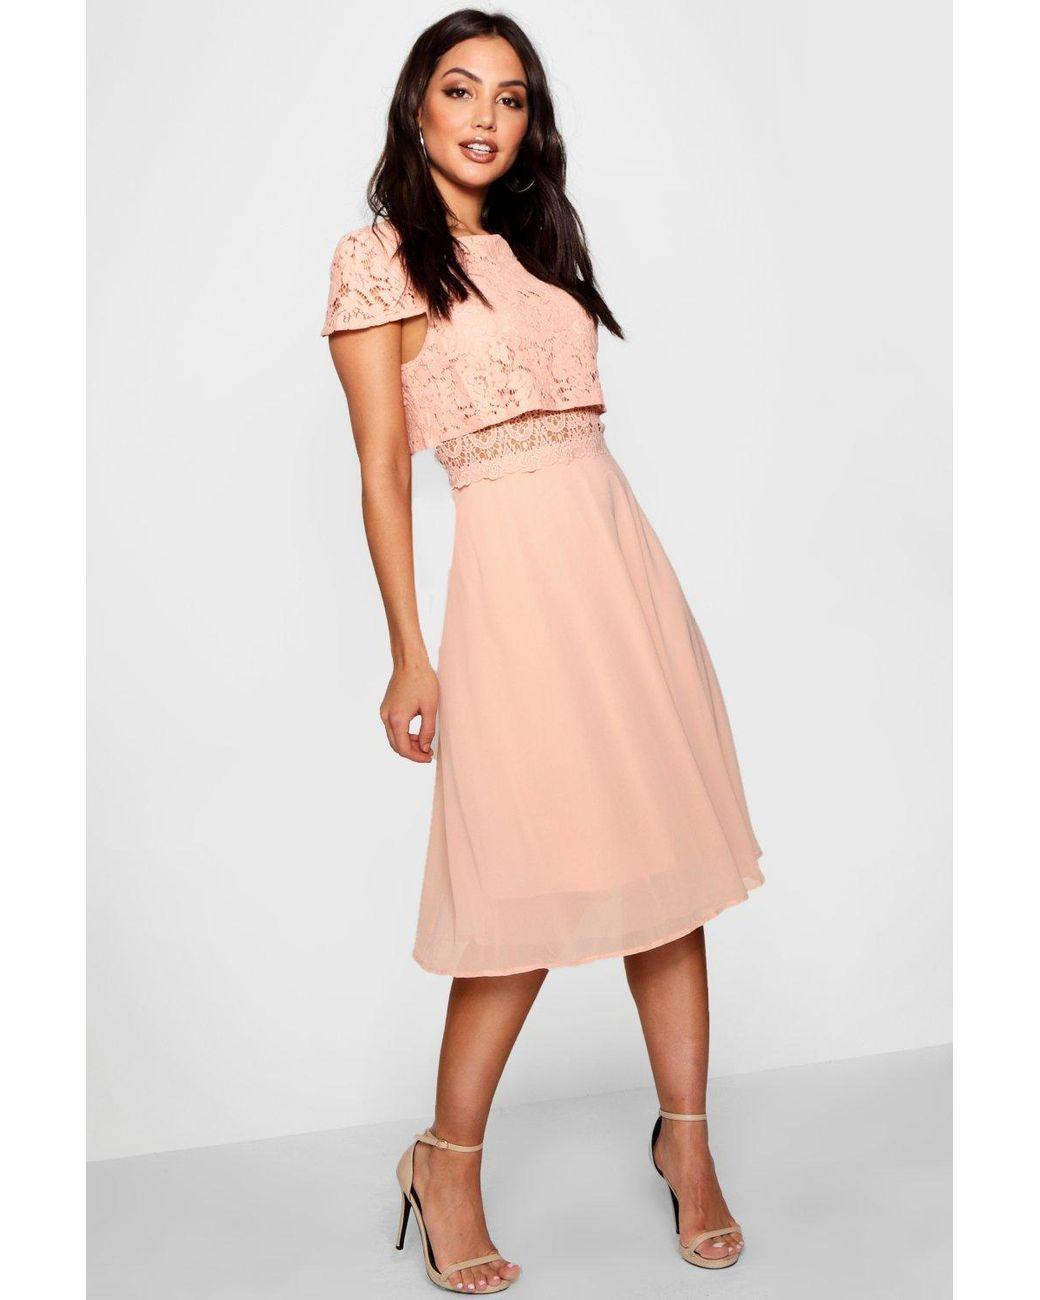 3554533f109fd Boohoo Lace Top Chiffon Skater Dress in Pink - Lyst